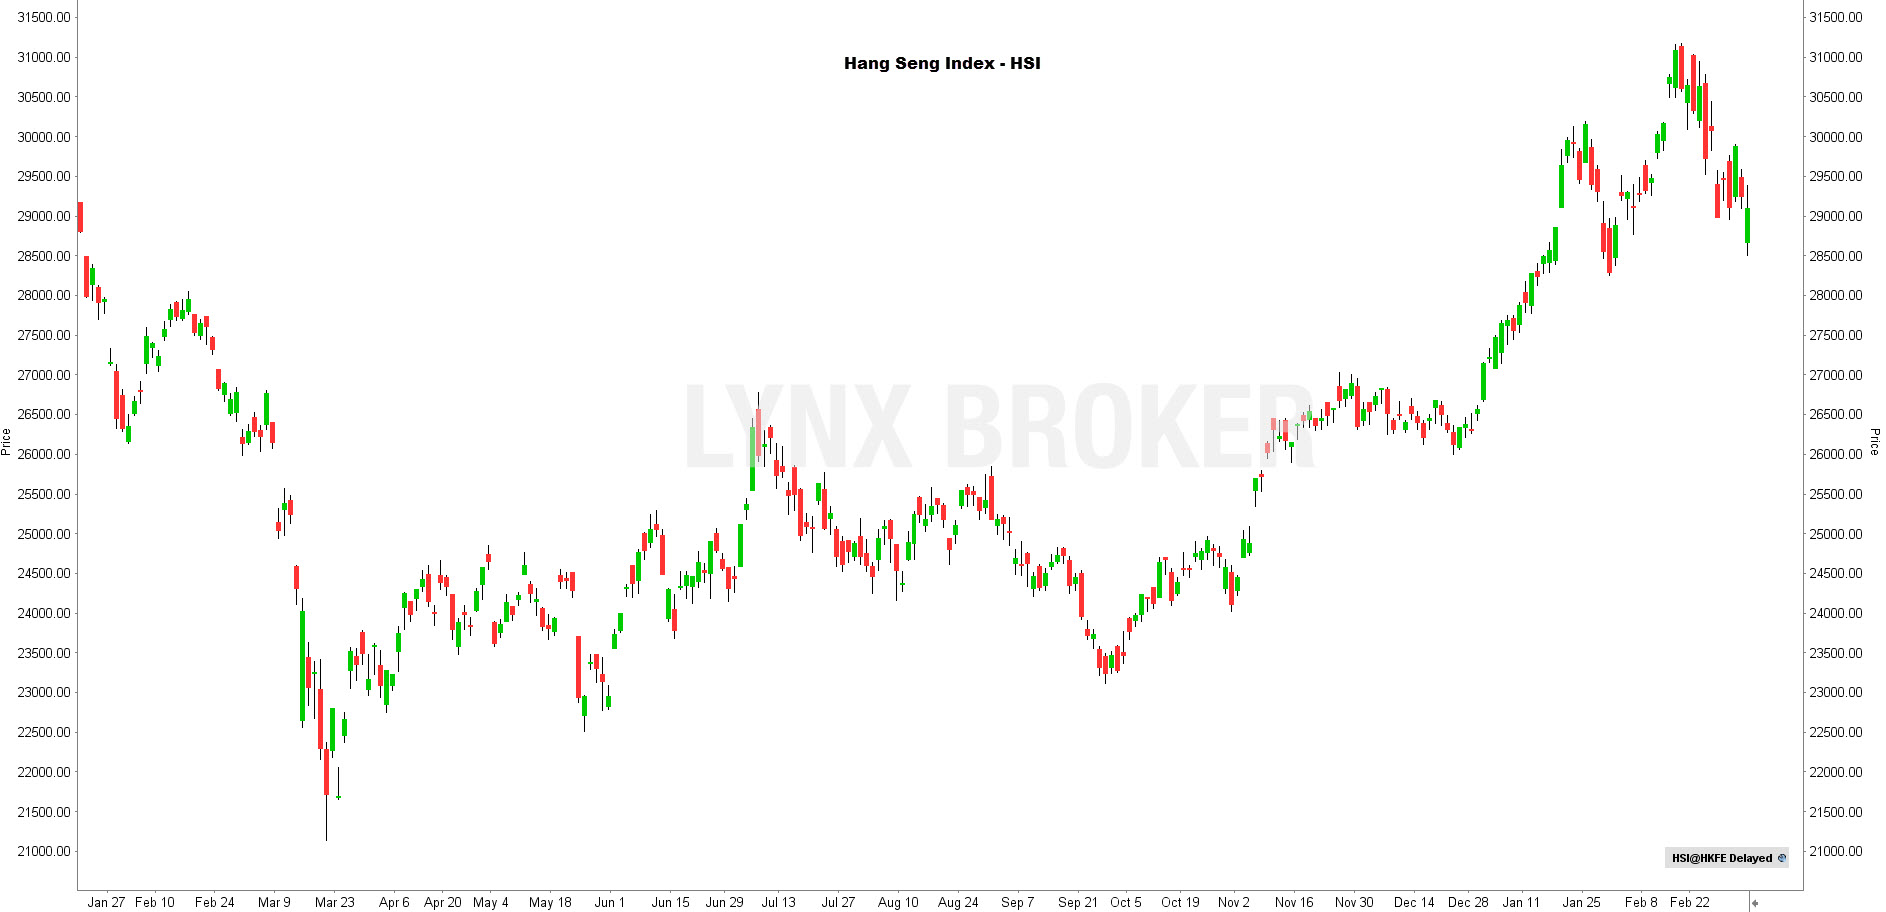 la chronique lynx broker 050321 - graphique Hang Seng